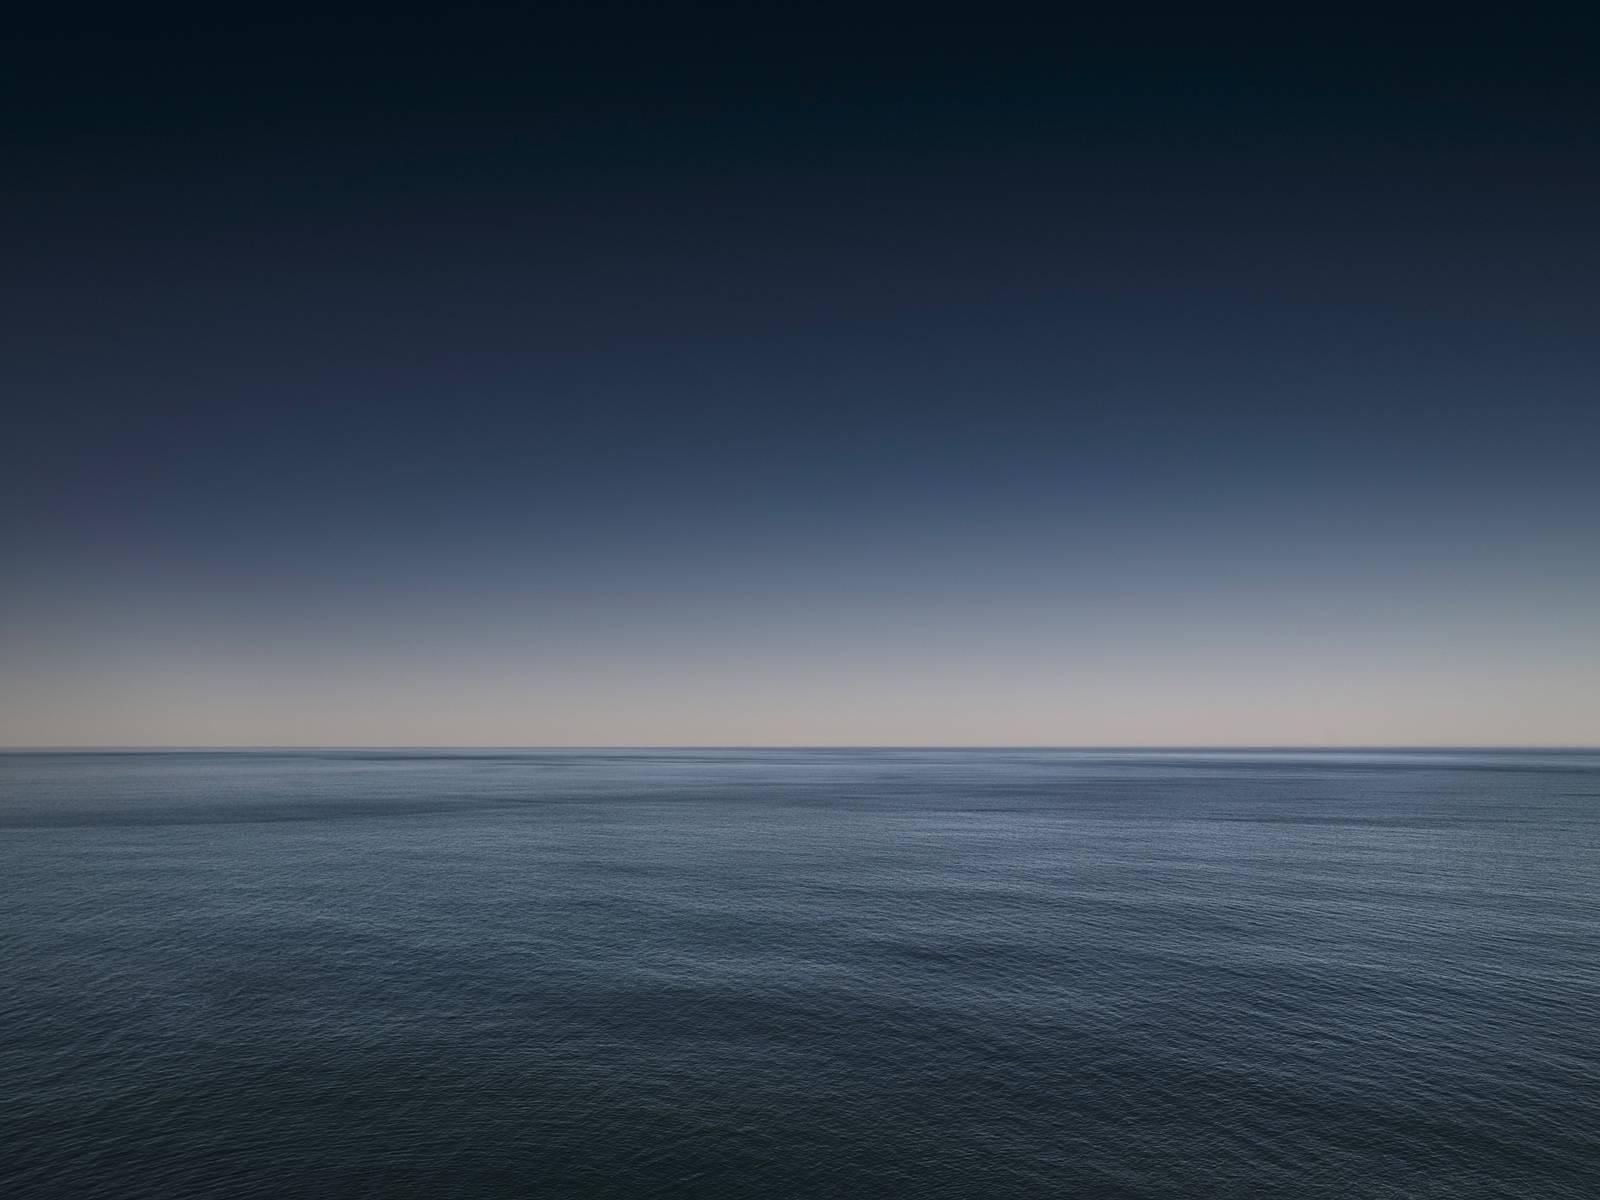 Seascape I - large format photograph of blue tone horizon and sea